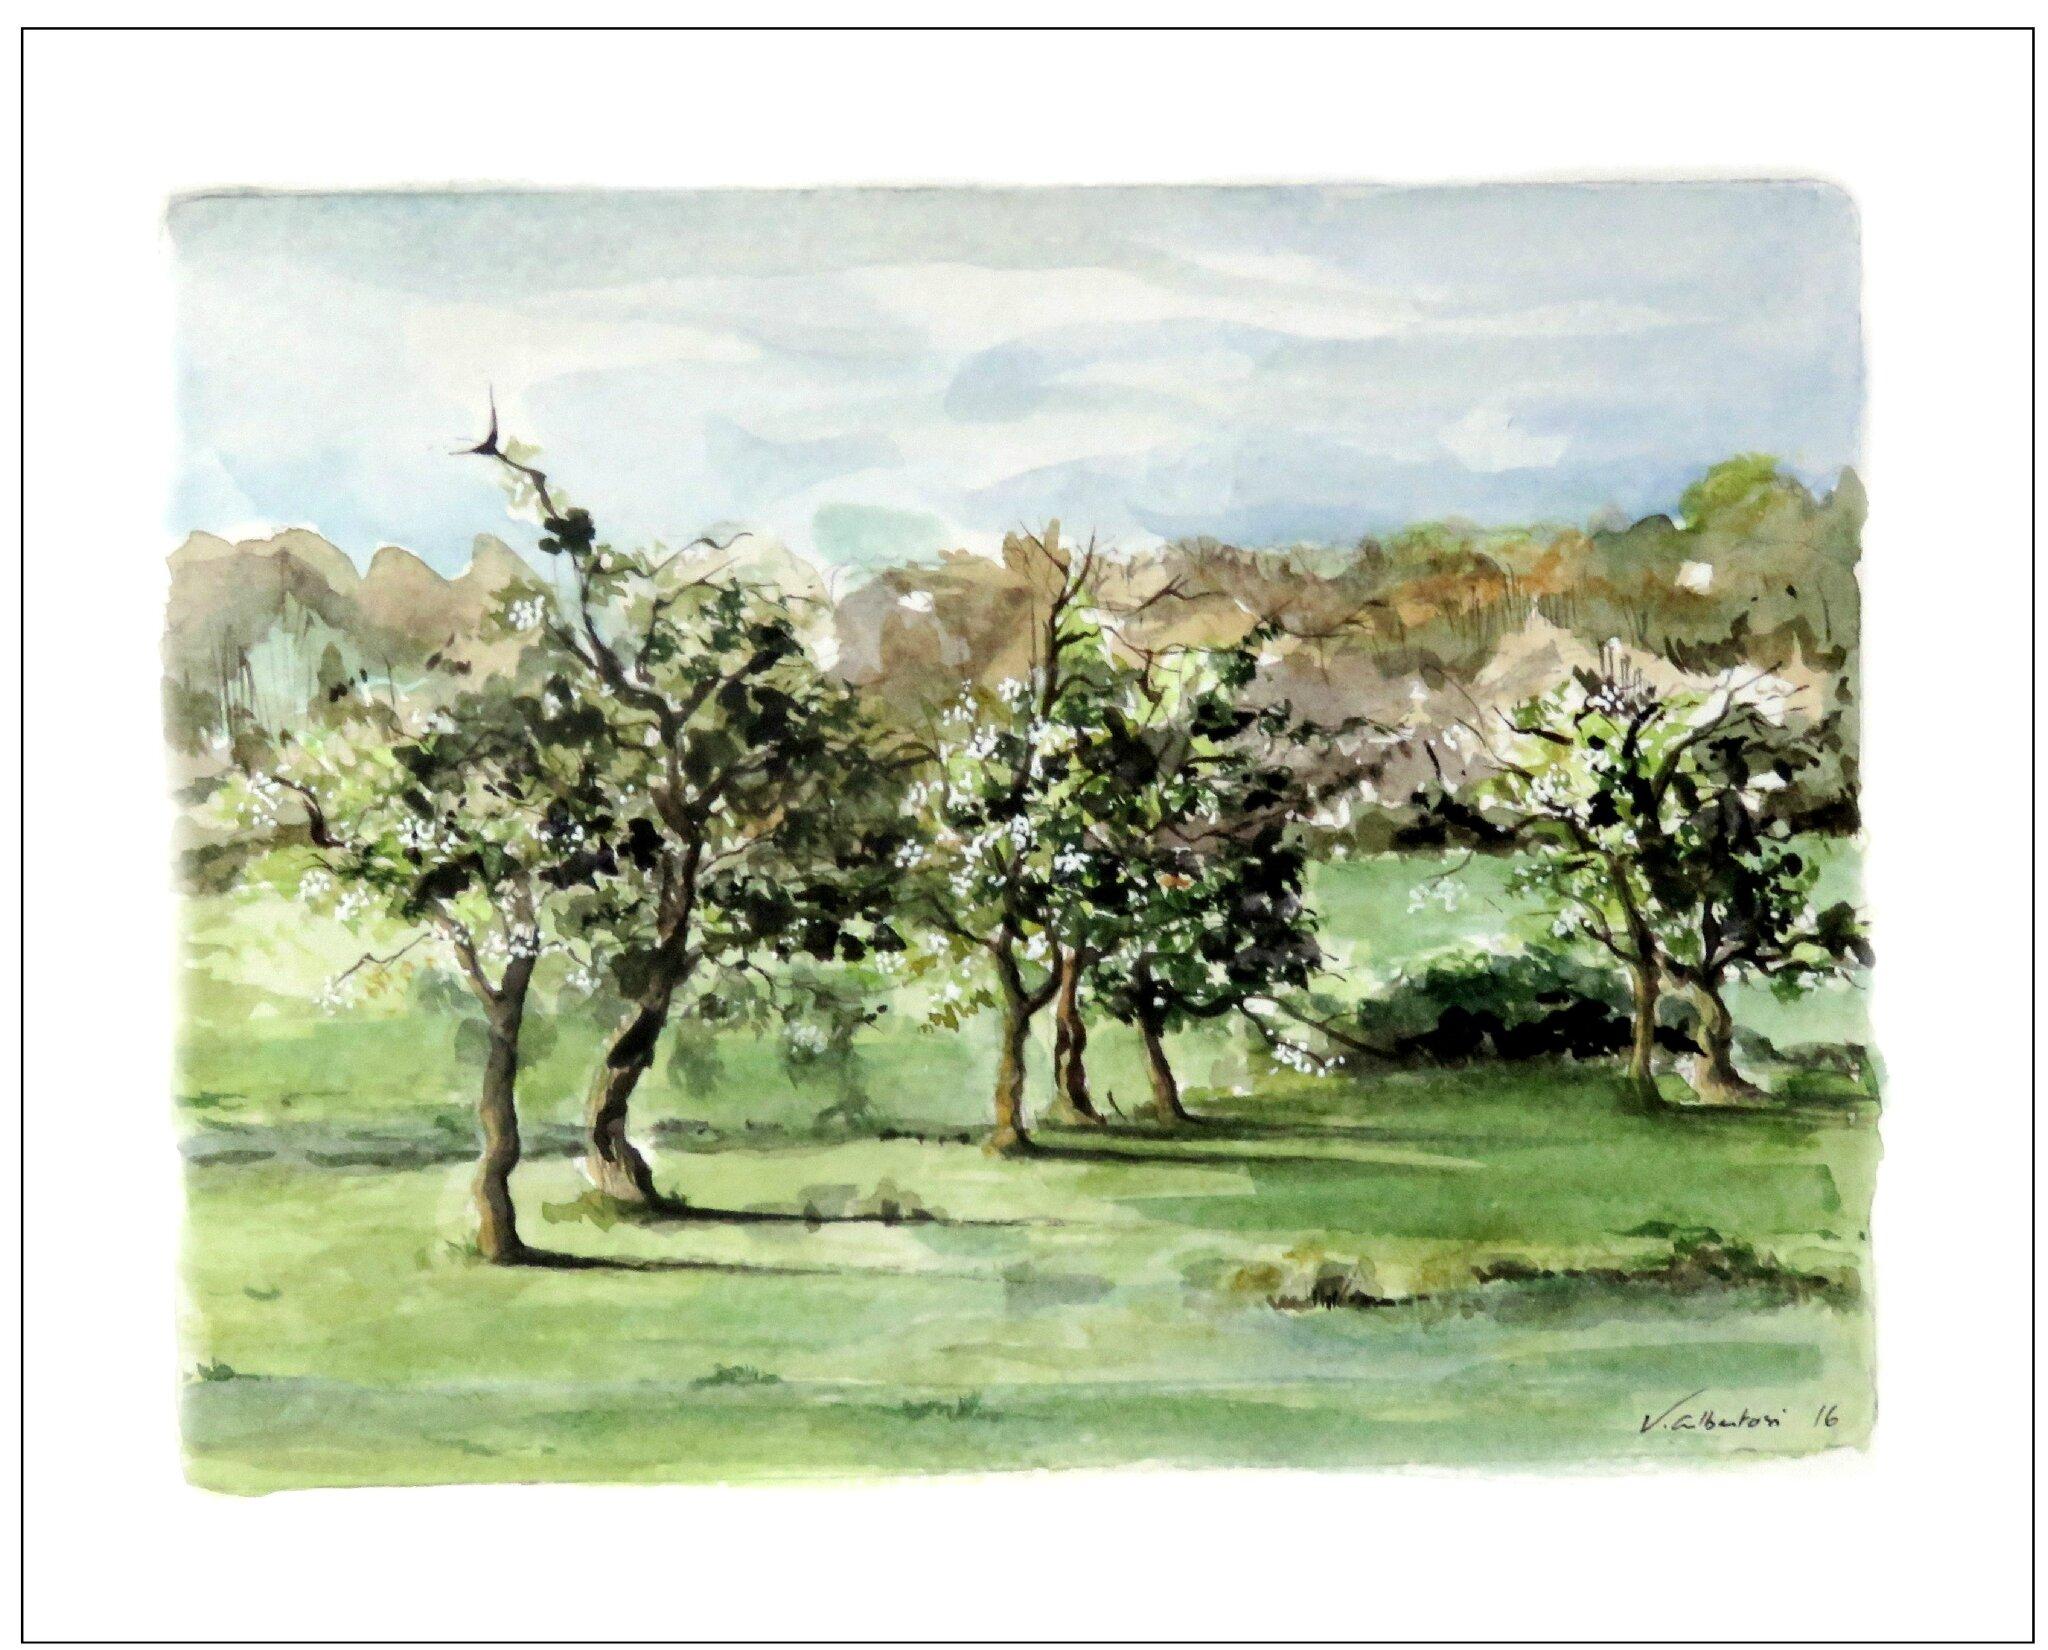 watercolor french landscape aquarelle valerie albertosi Boisemont